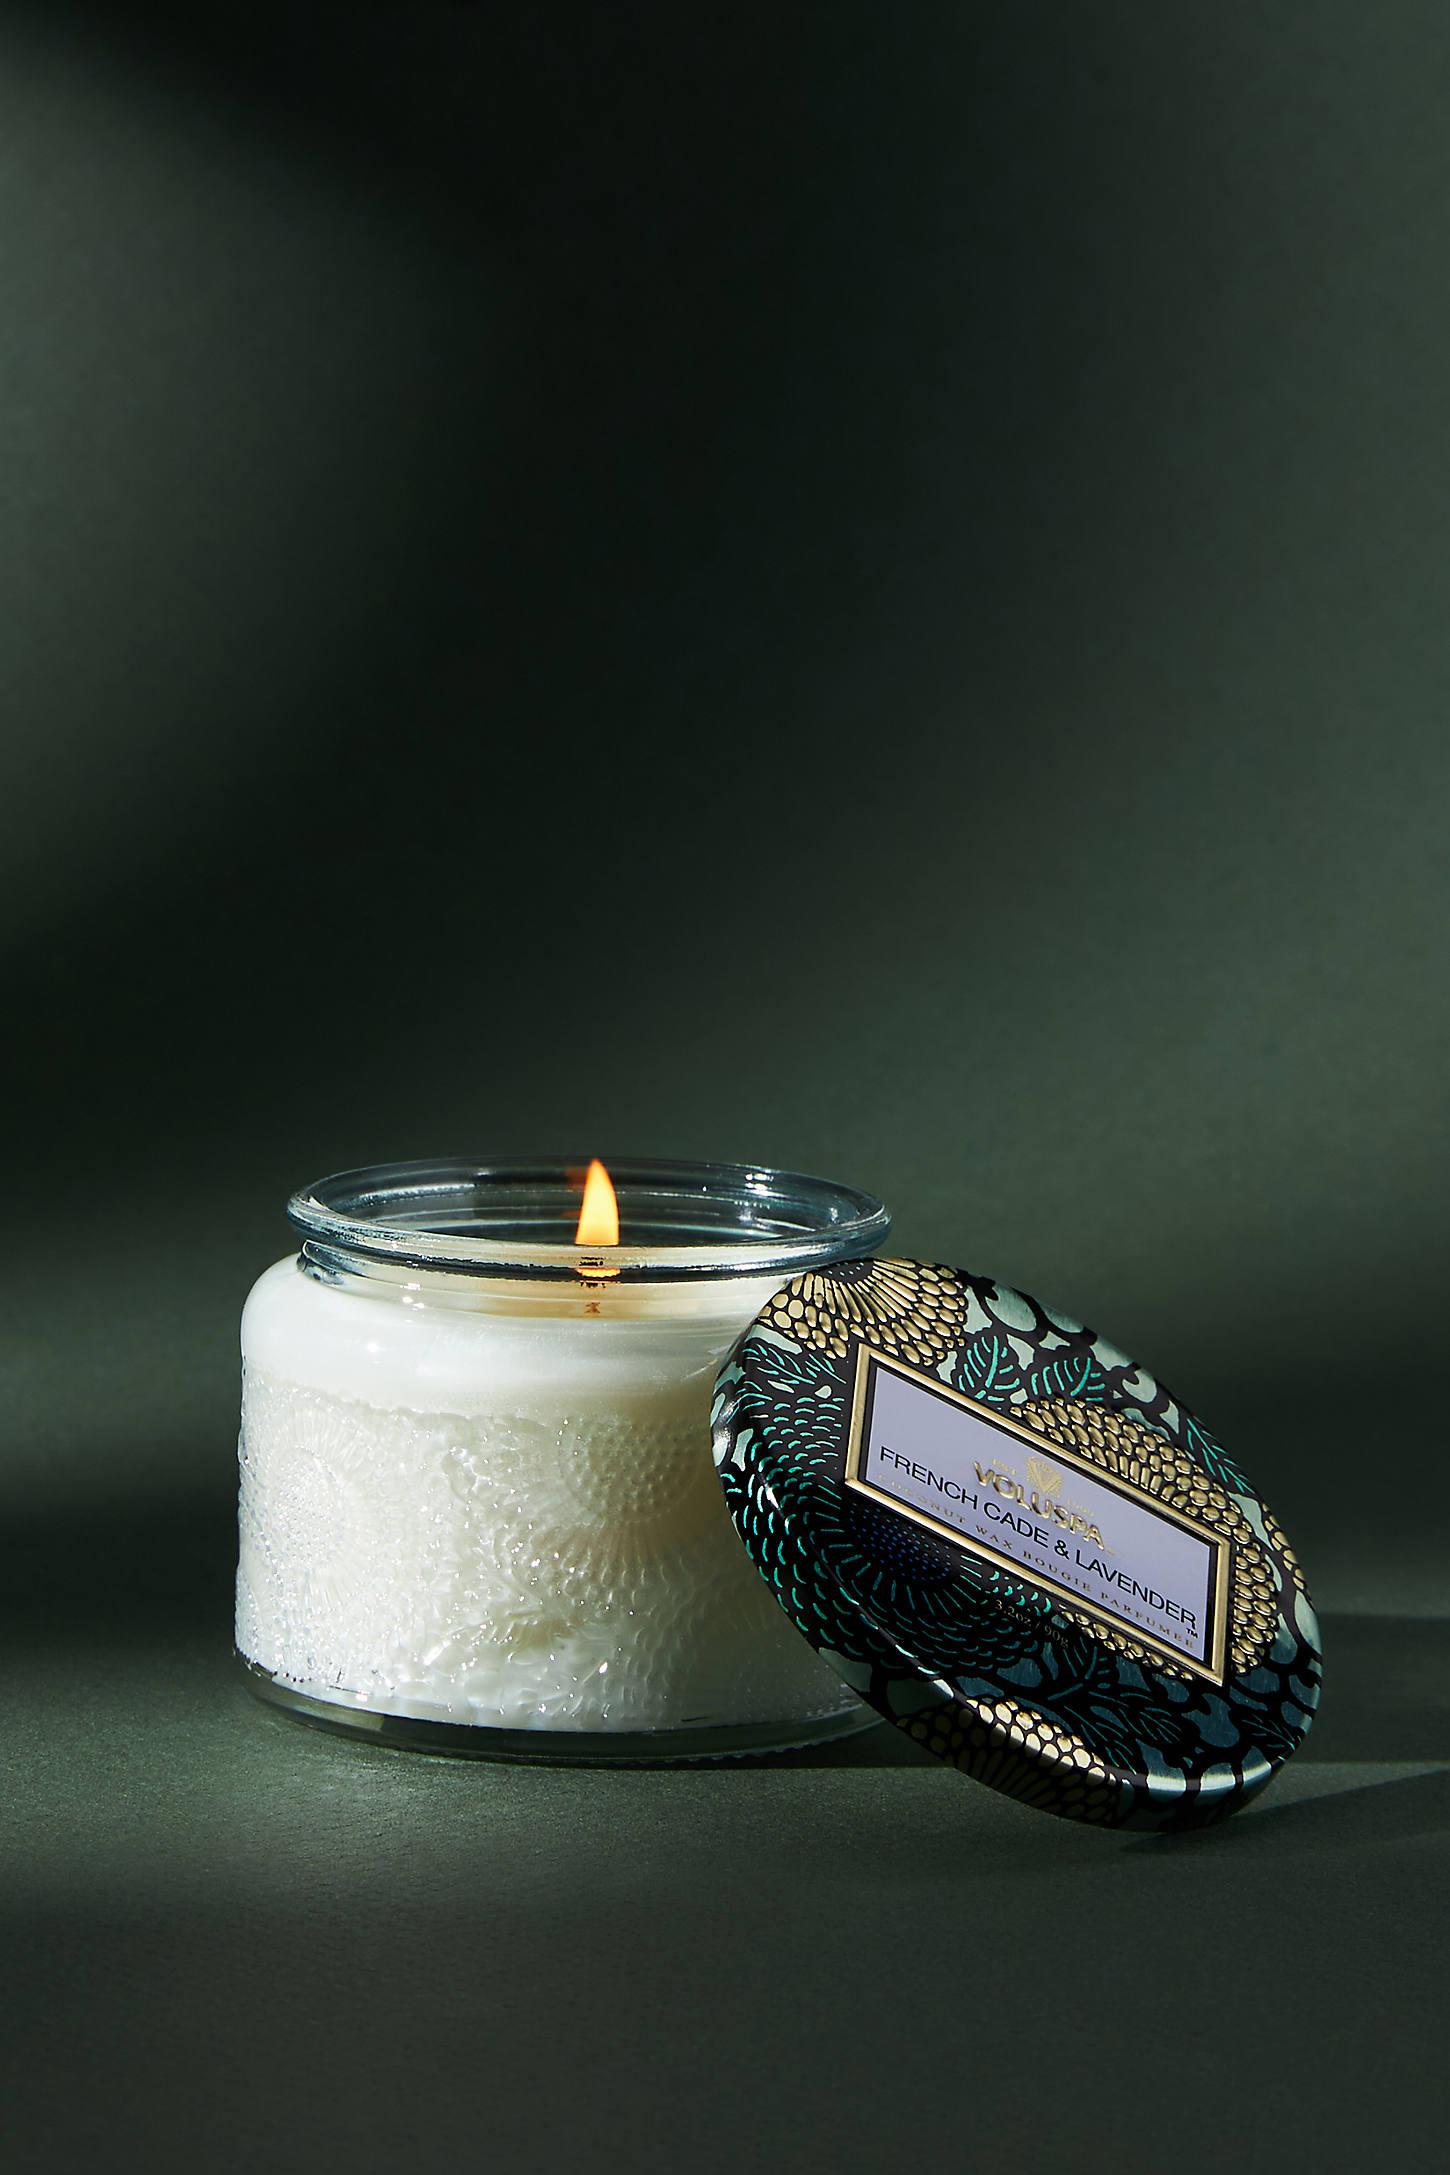 Voluspa Limited Edition Japonica Mini Candle